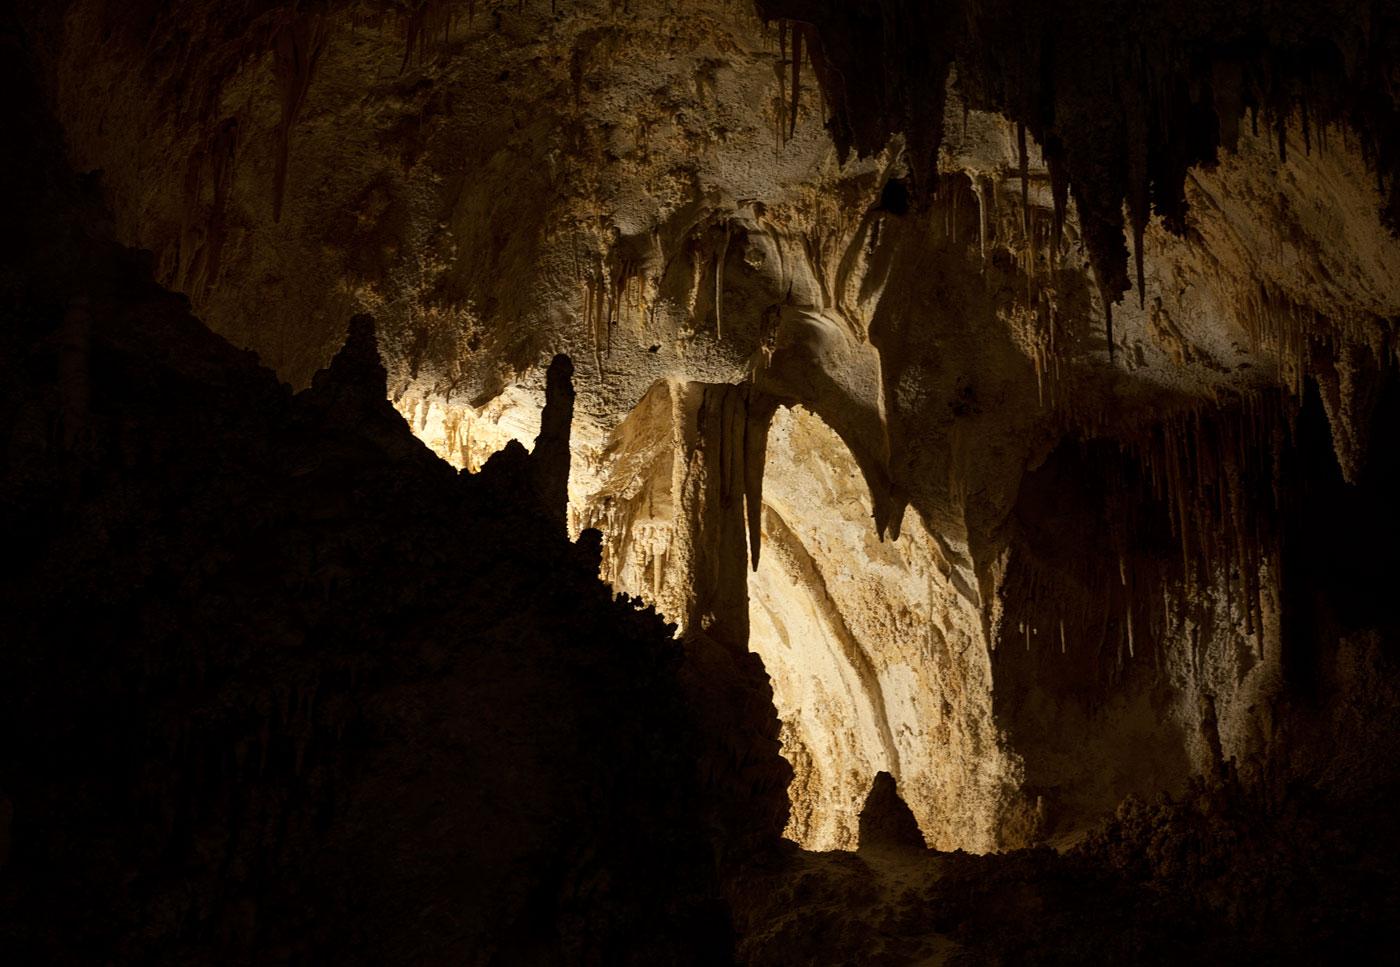 Carlsbad-Caverns-National-Park-ABP-Side-Tunnel4.jpg